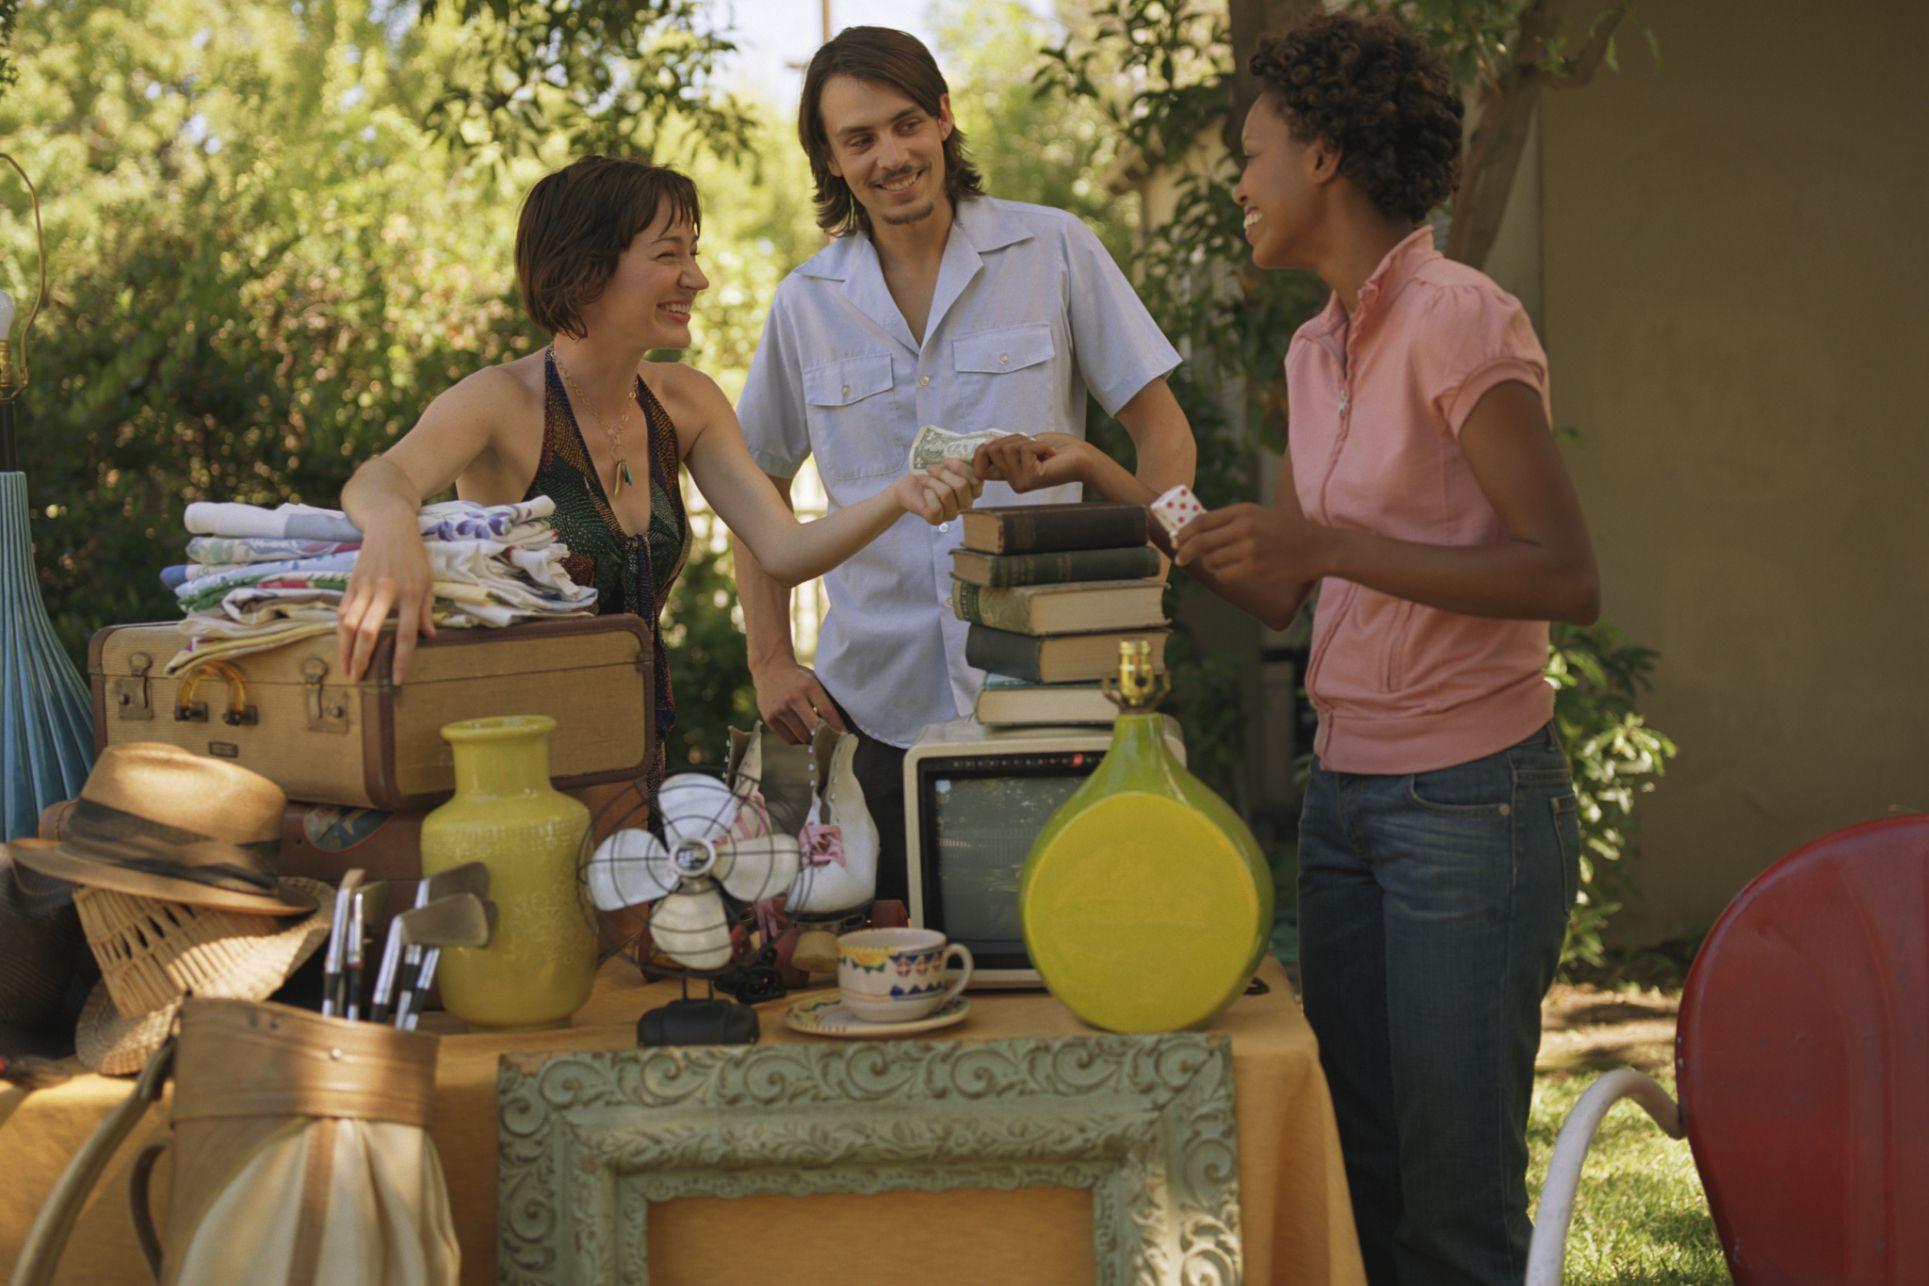 How to Haggle at Flea Markets, Yard Sales, and More